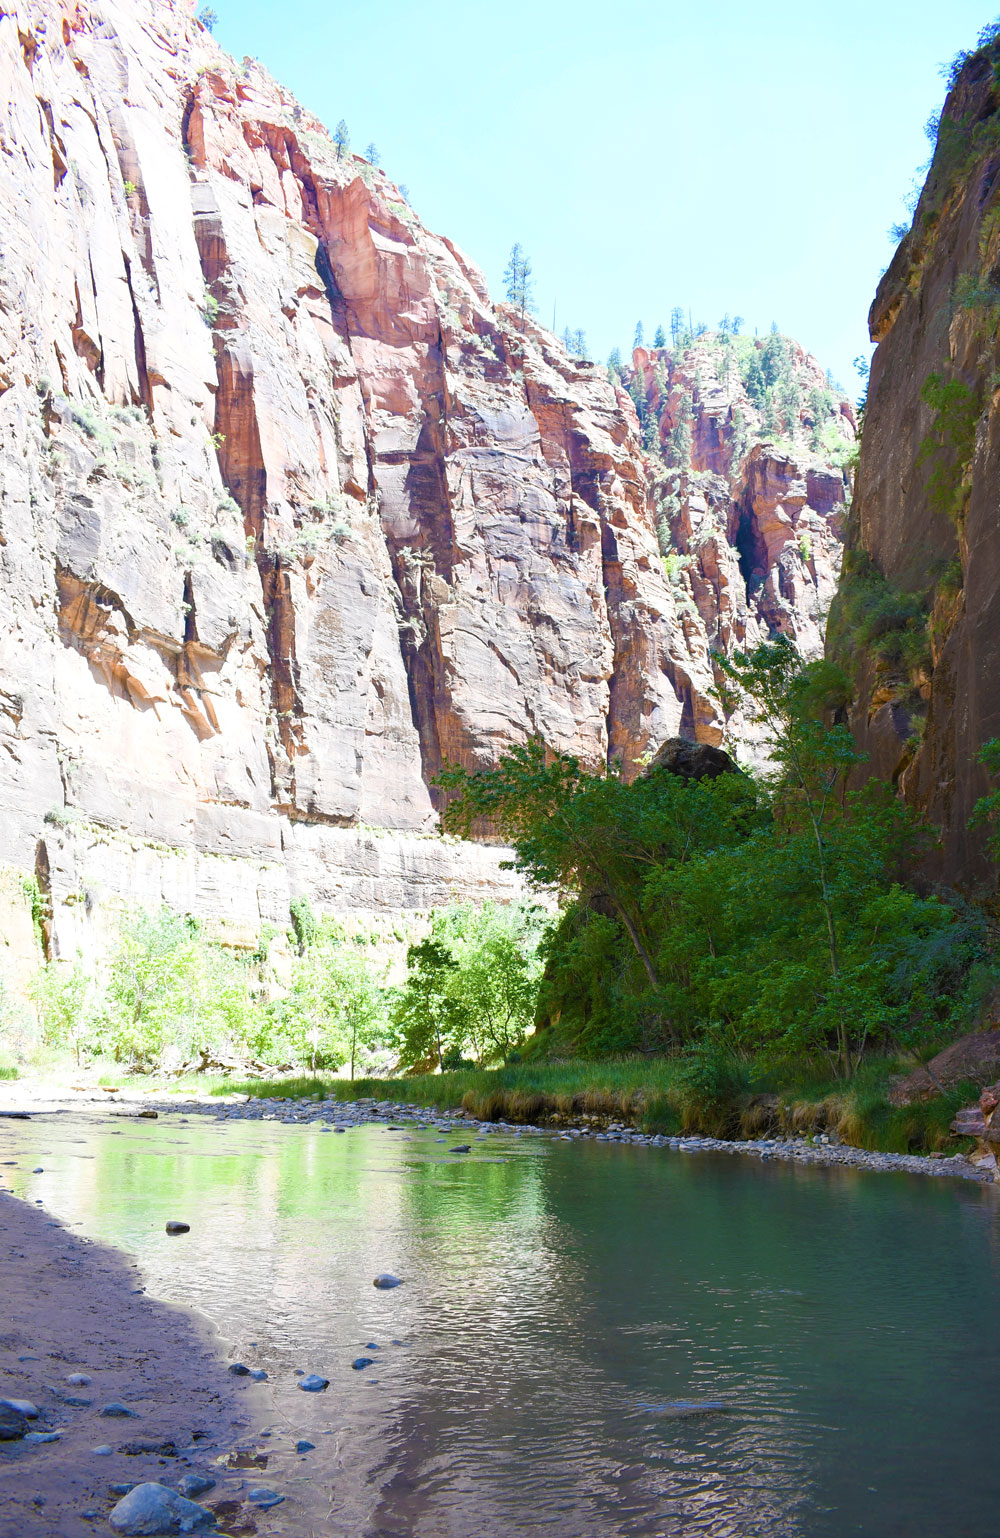 Red canyon walls and bright green trees at Zion Canyon